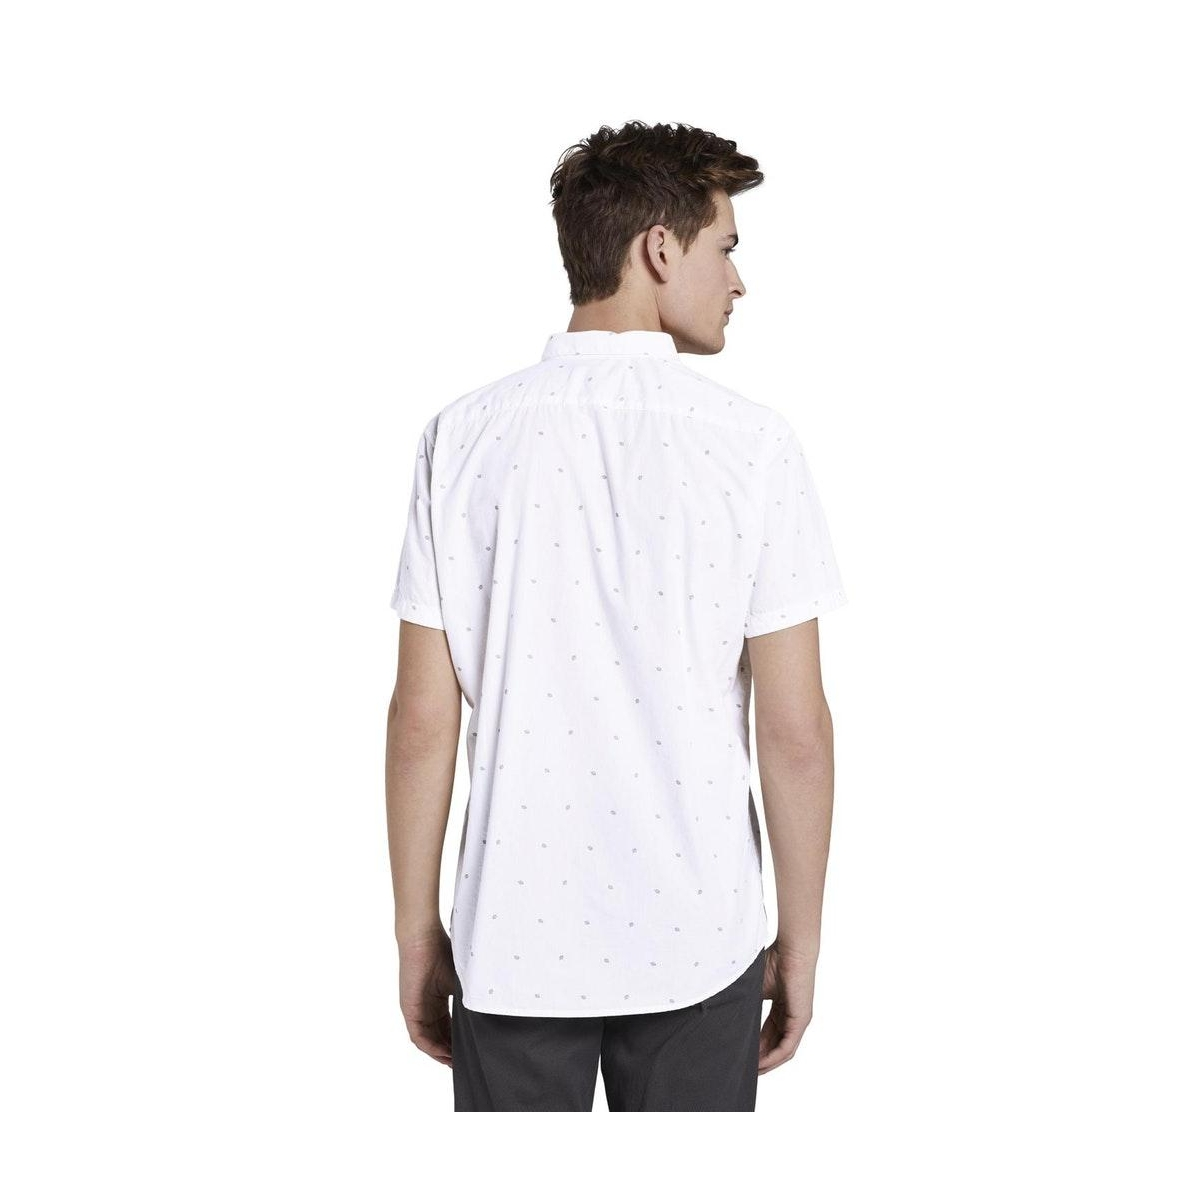 overhemd met korte mouwen 1021164xx12 tom tailor overhemd 22918